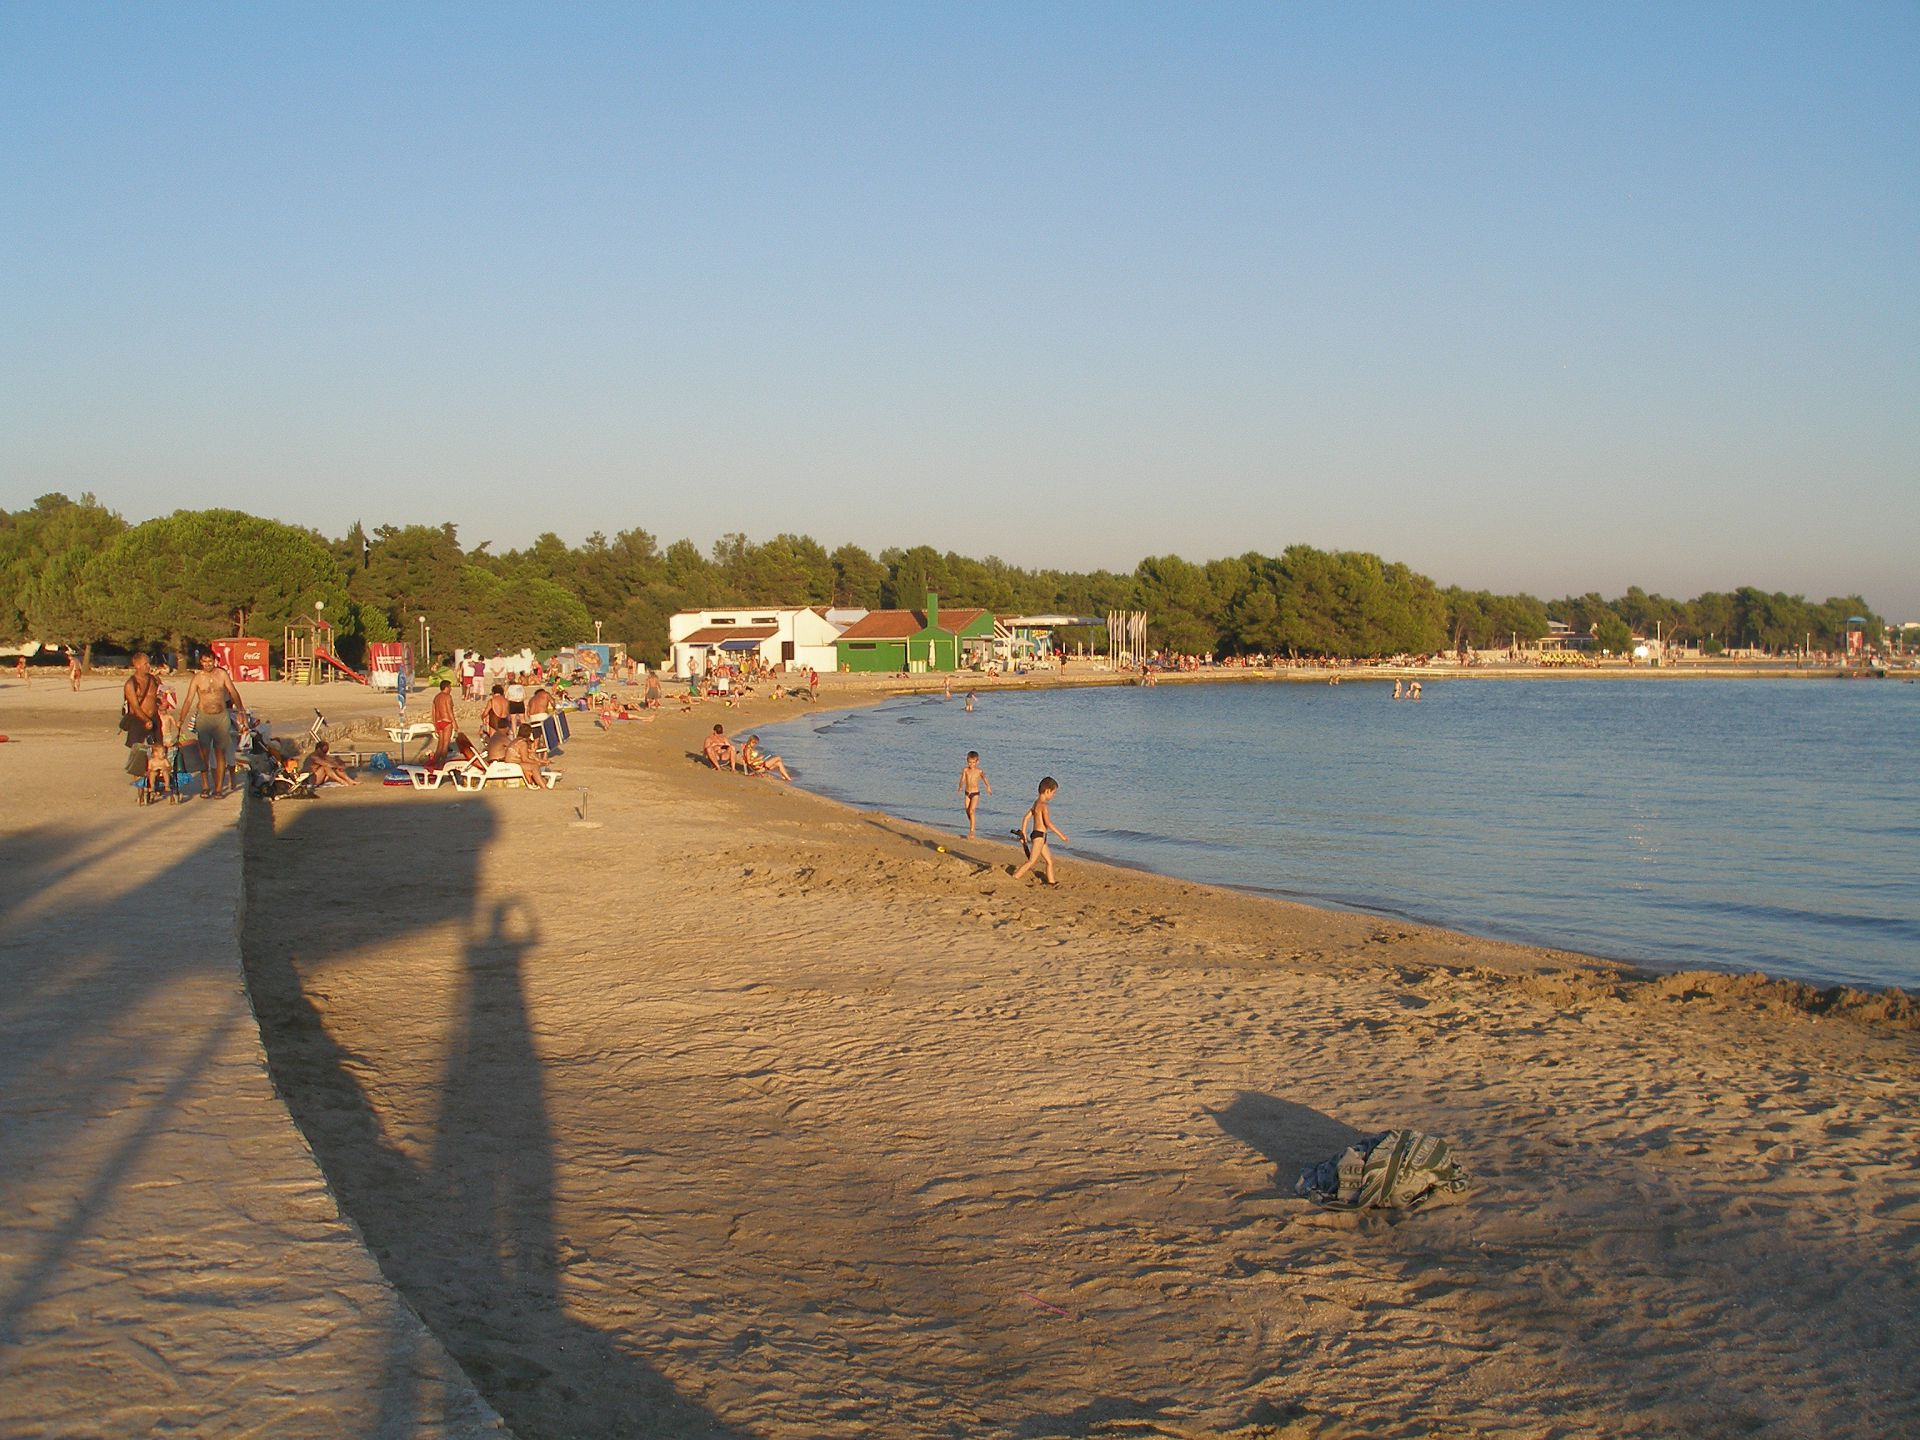 Holiday apartment 001PRIV A1(4+2) - Privlaka (742036), Privlaka, , Dalmatia, Croatia, picture 9